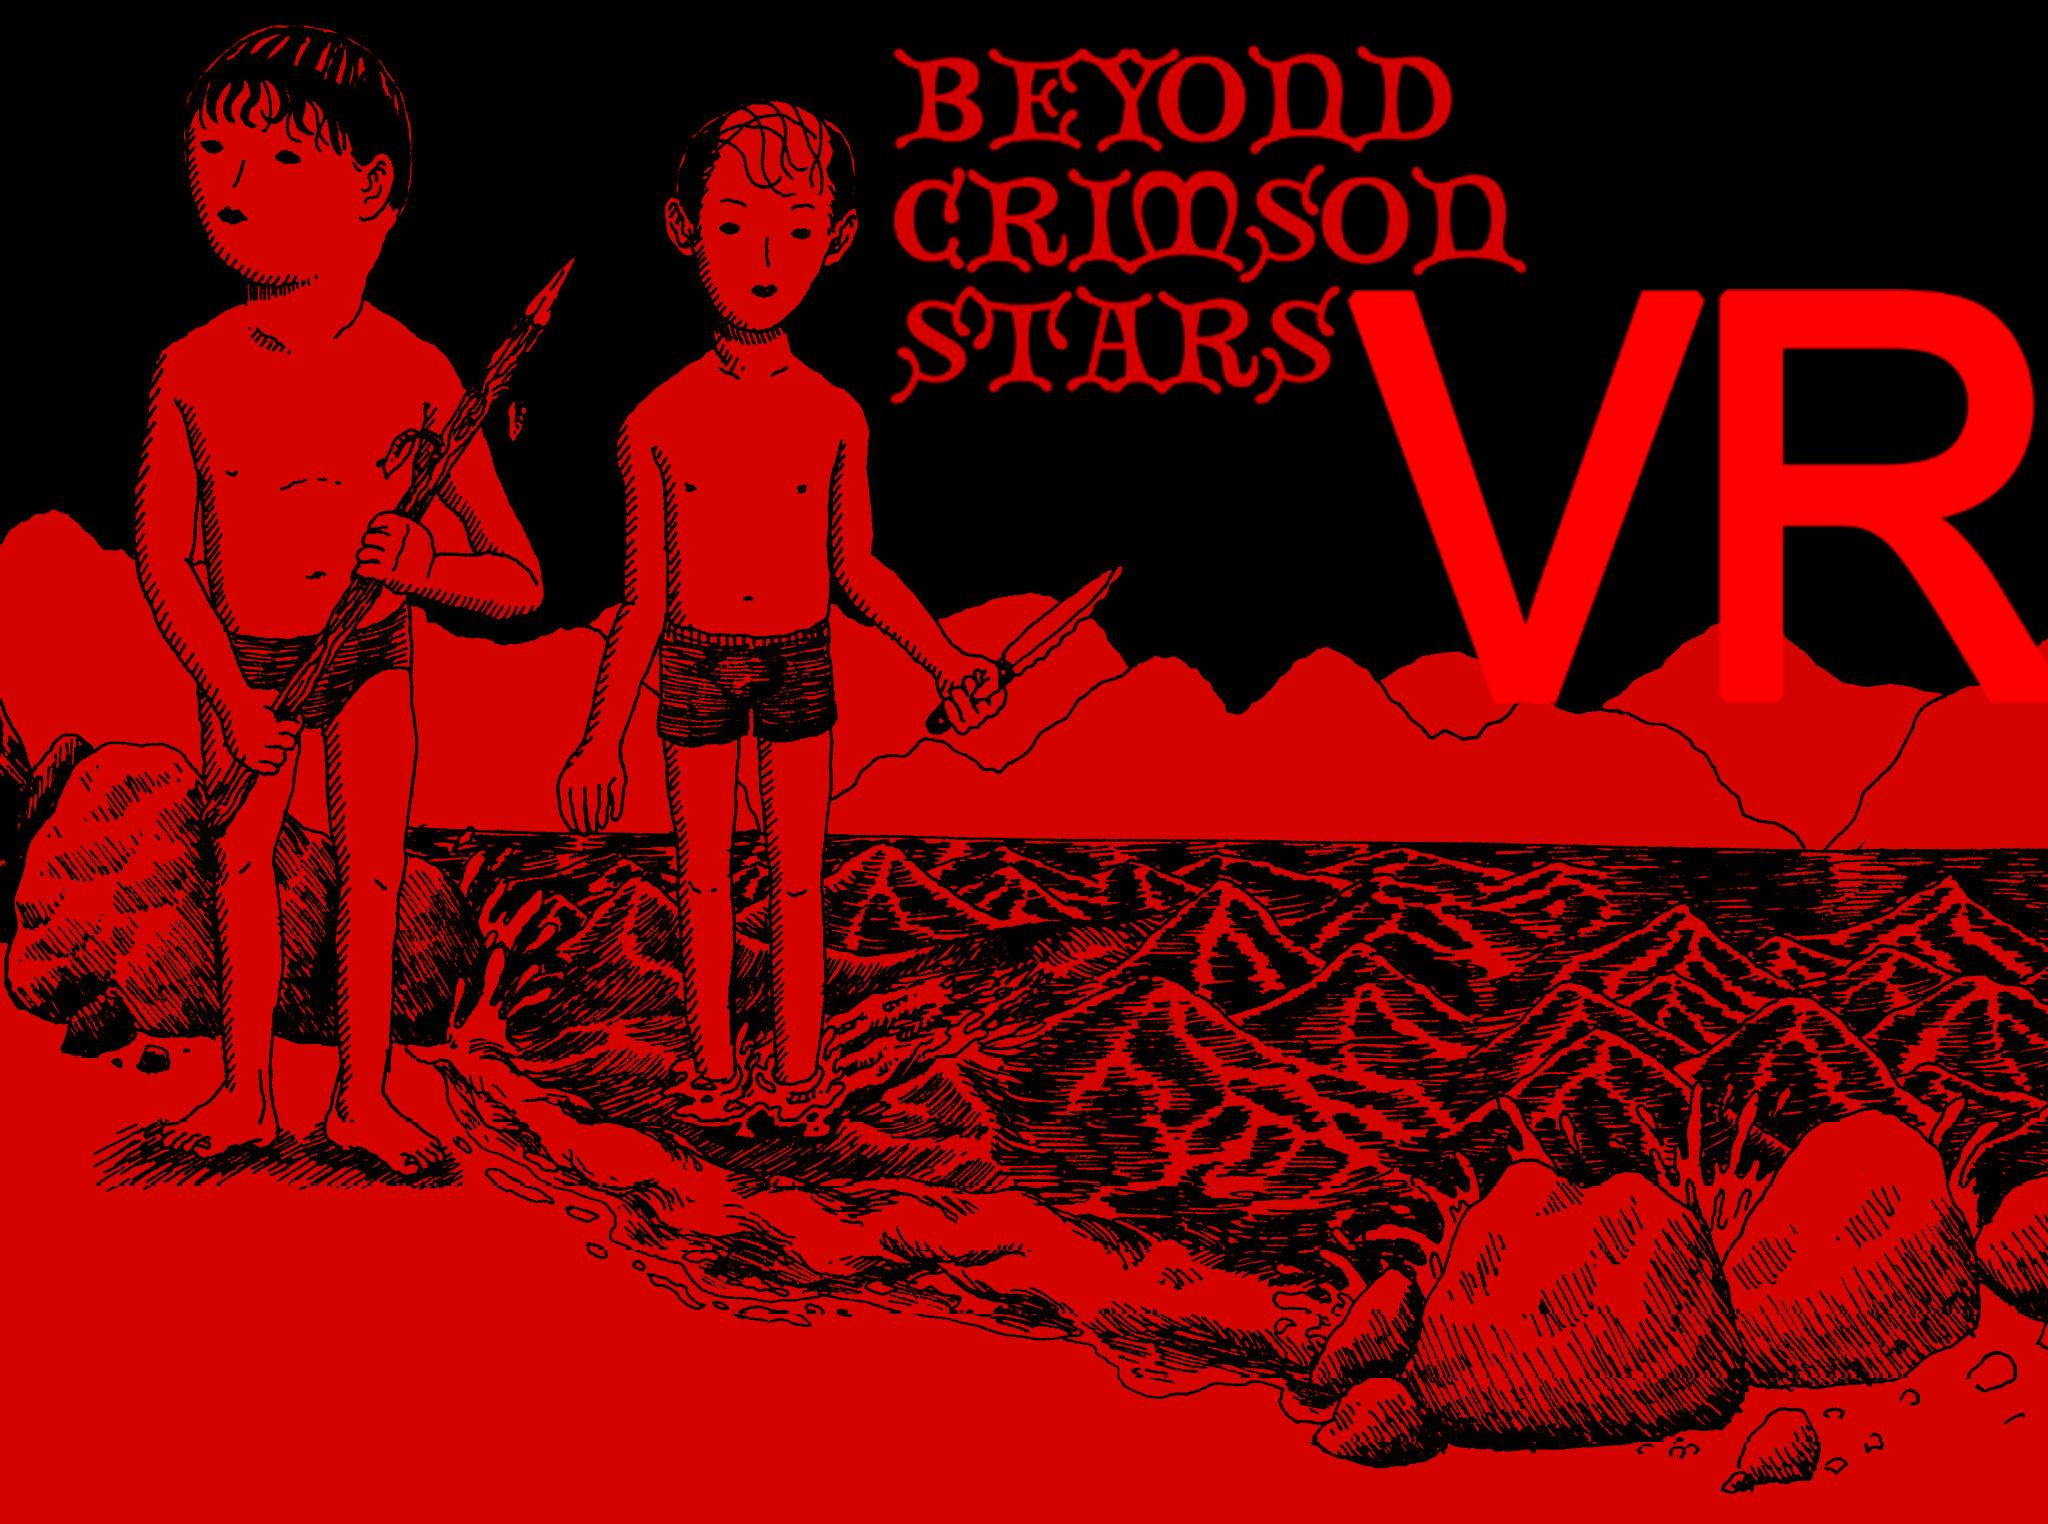 beyond crimson stars VR